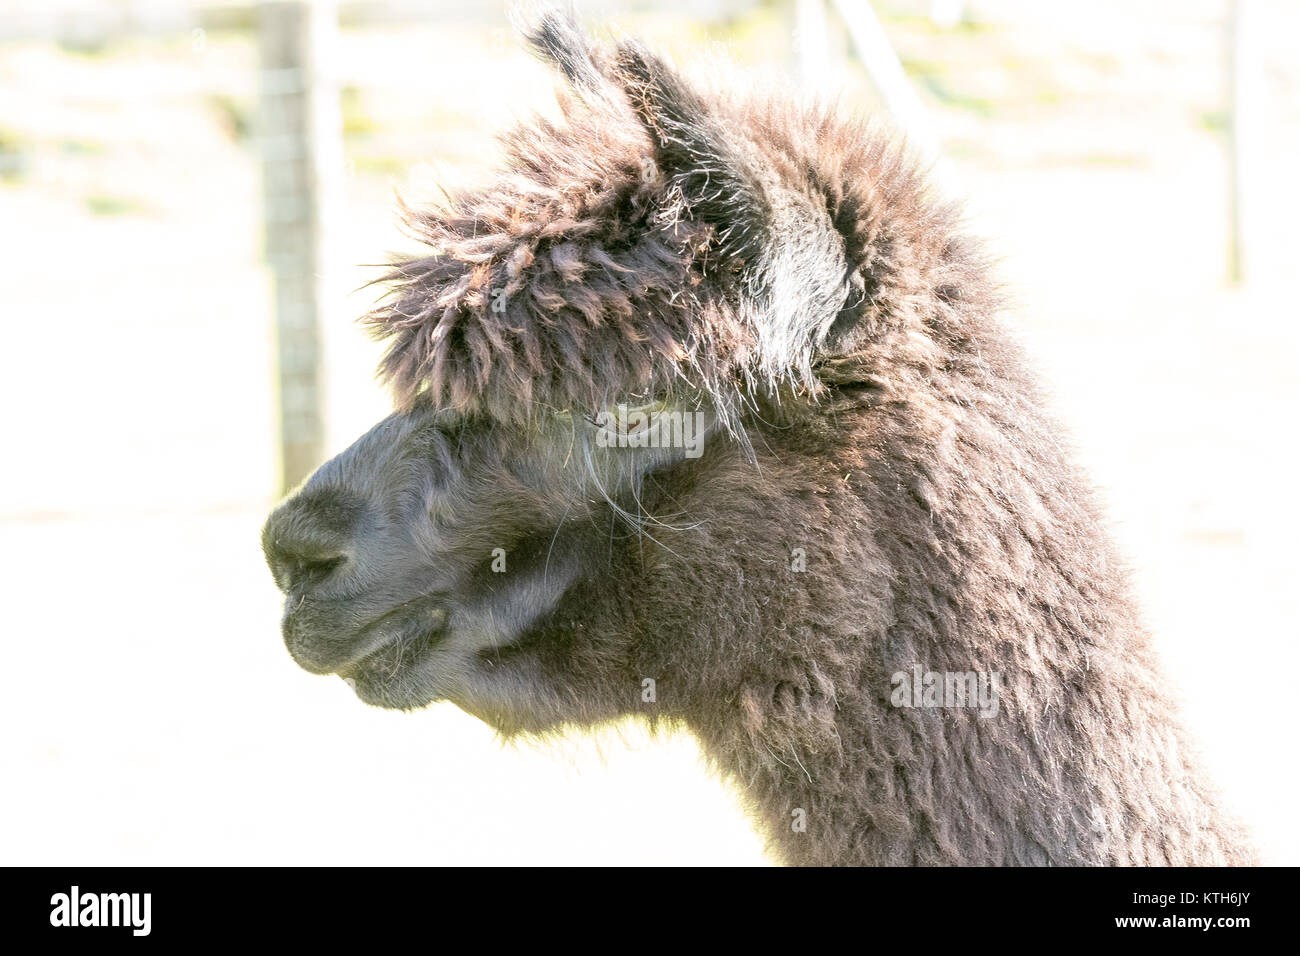 Alpaca Lama Pacos Vicugna Pacos - Stock Image